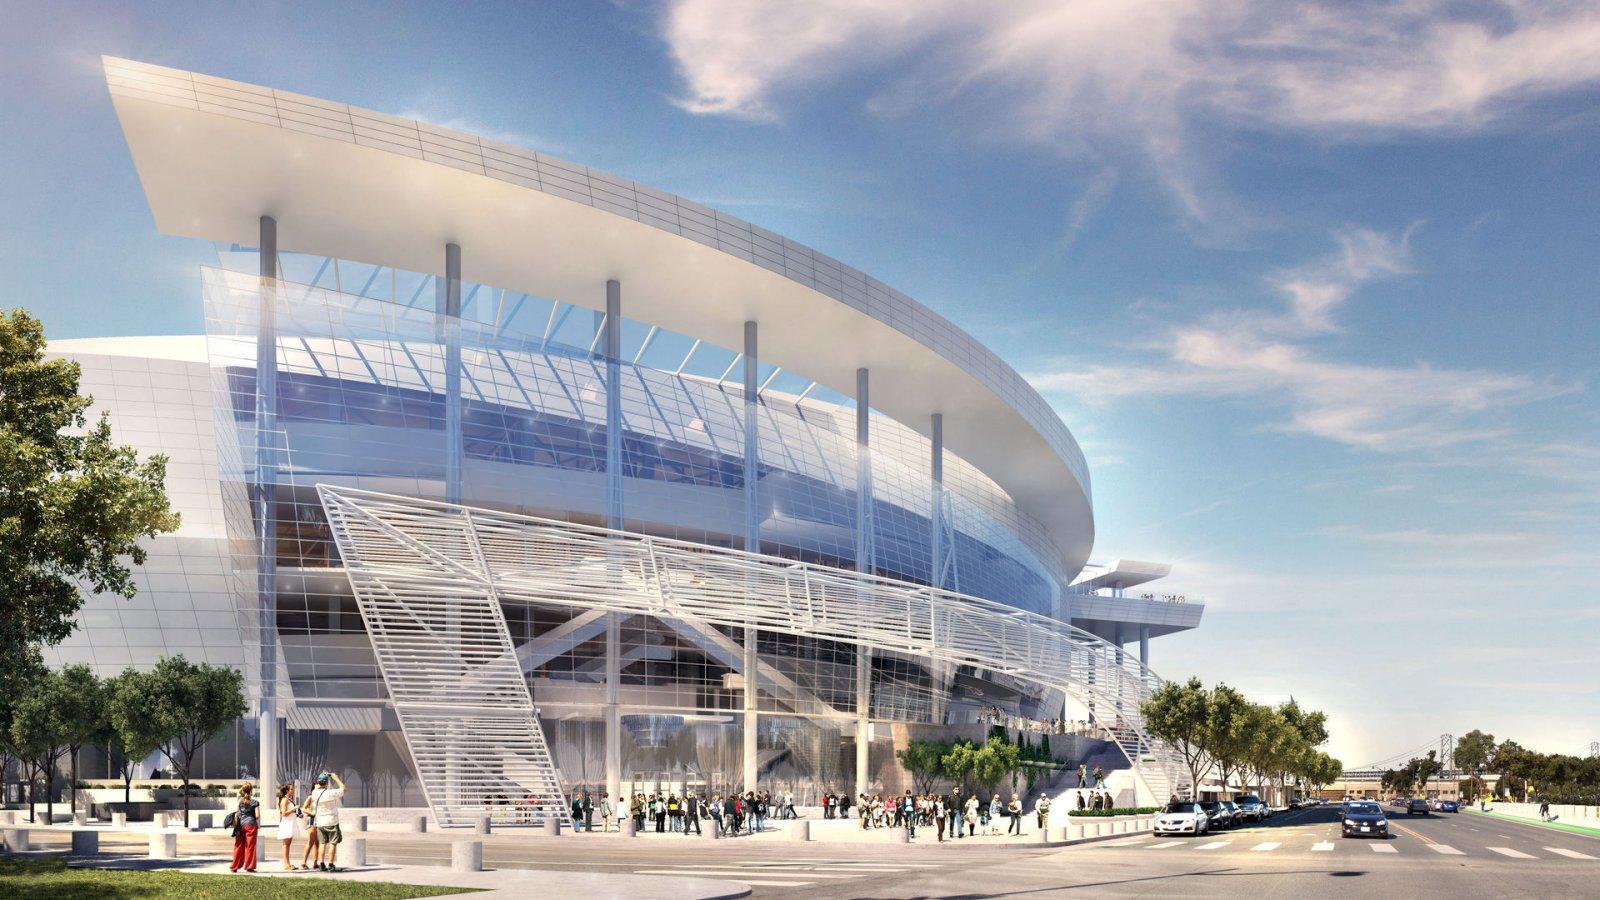 San Francisco Arena - Southeastern Entrance